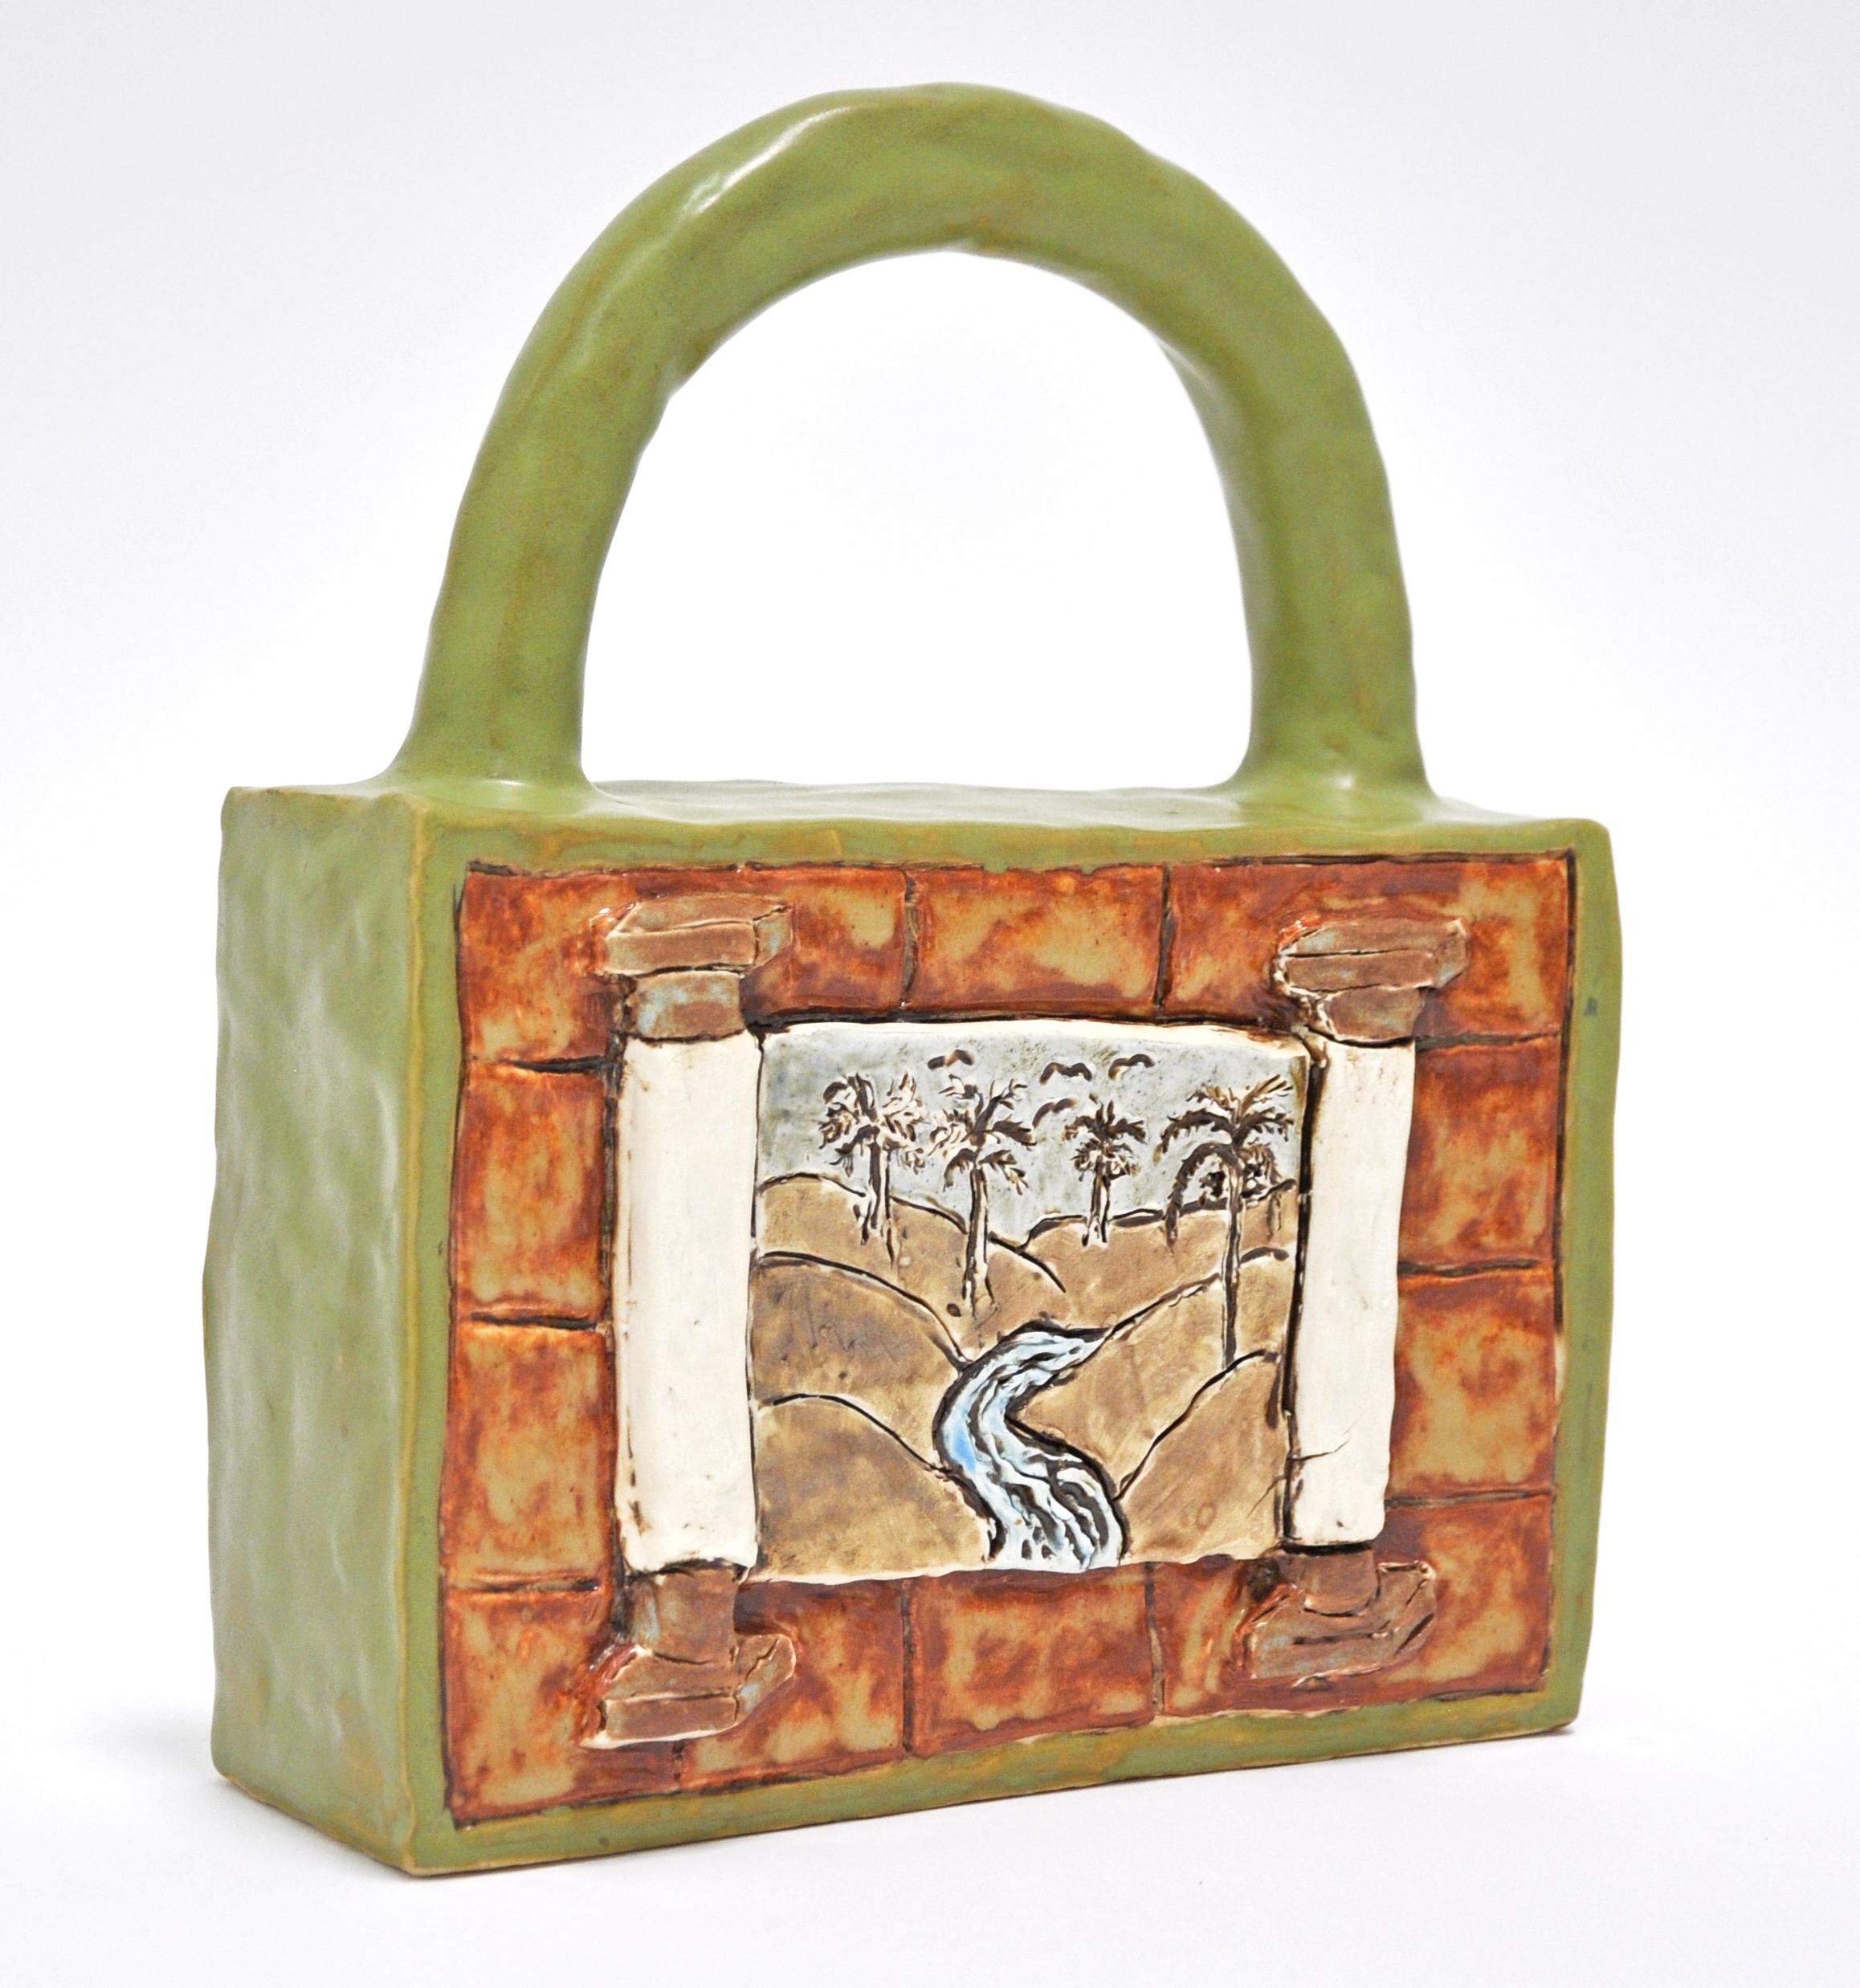 "Maryam Yousif, ""Cosmic Handbag: Scroll"", glazed porcelain, 8 x 3 x 10.5 in, 2019, $1100"